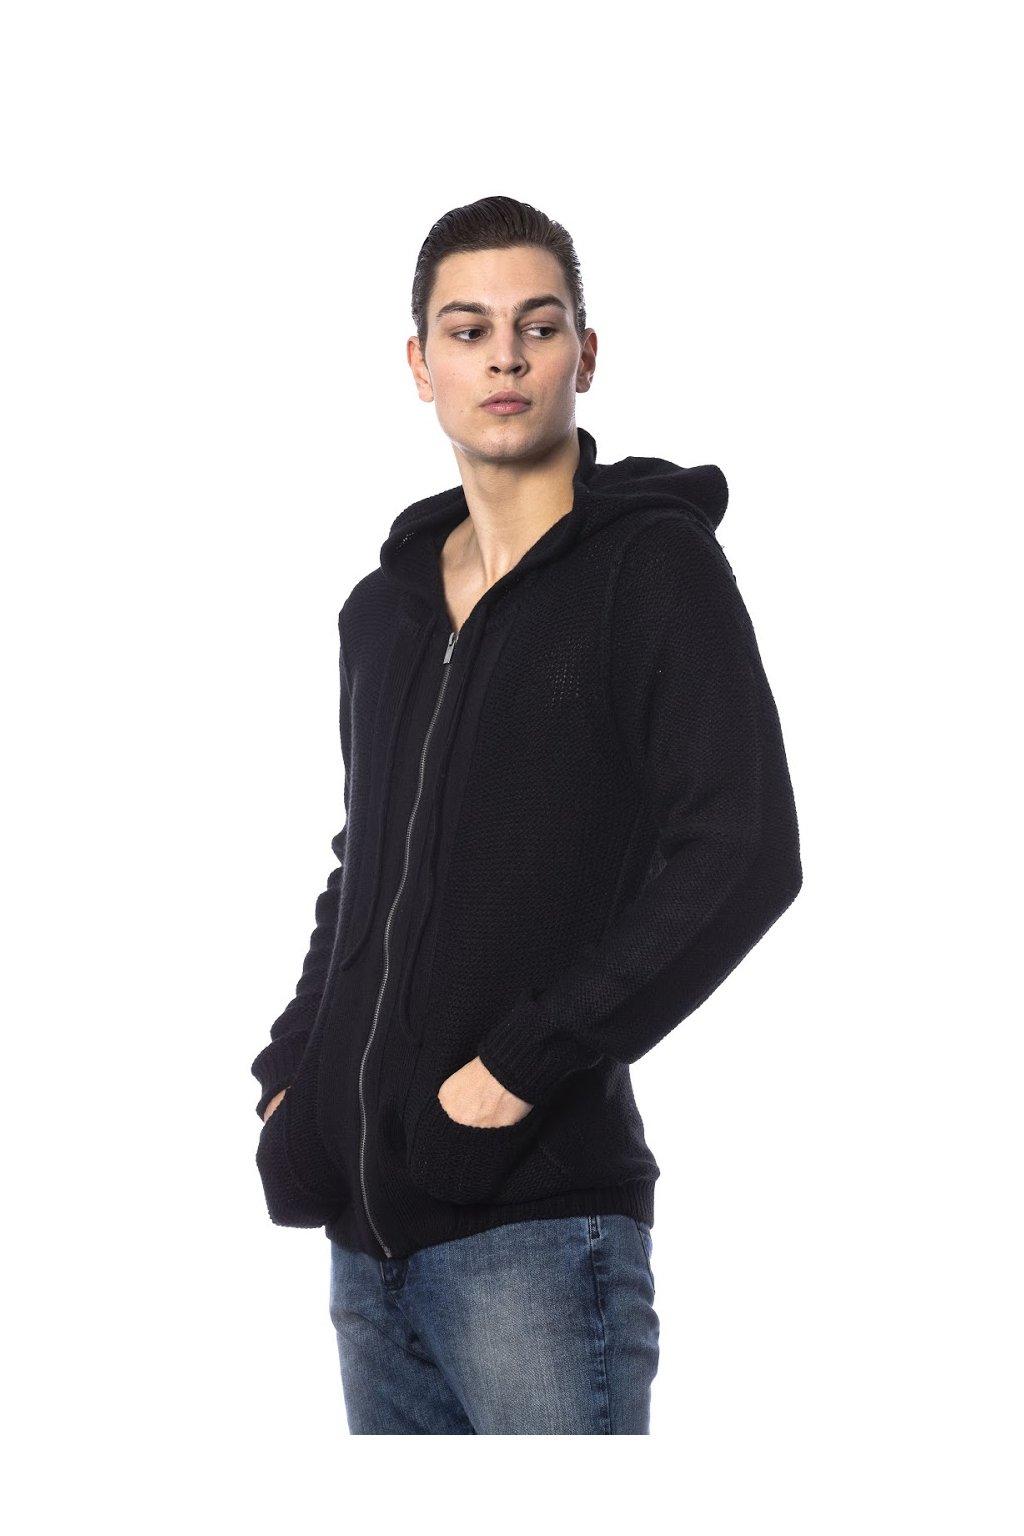 znackova panska mikina s kapuci Gaudi Jeans cerna (1)